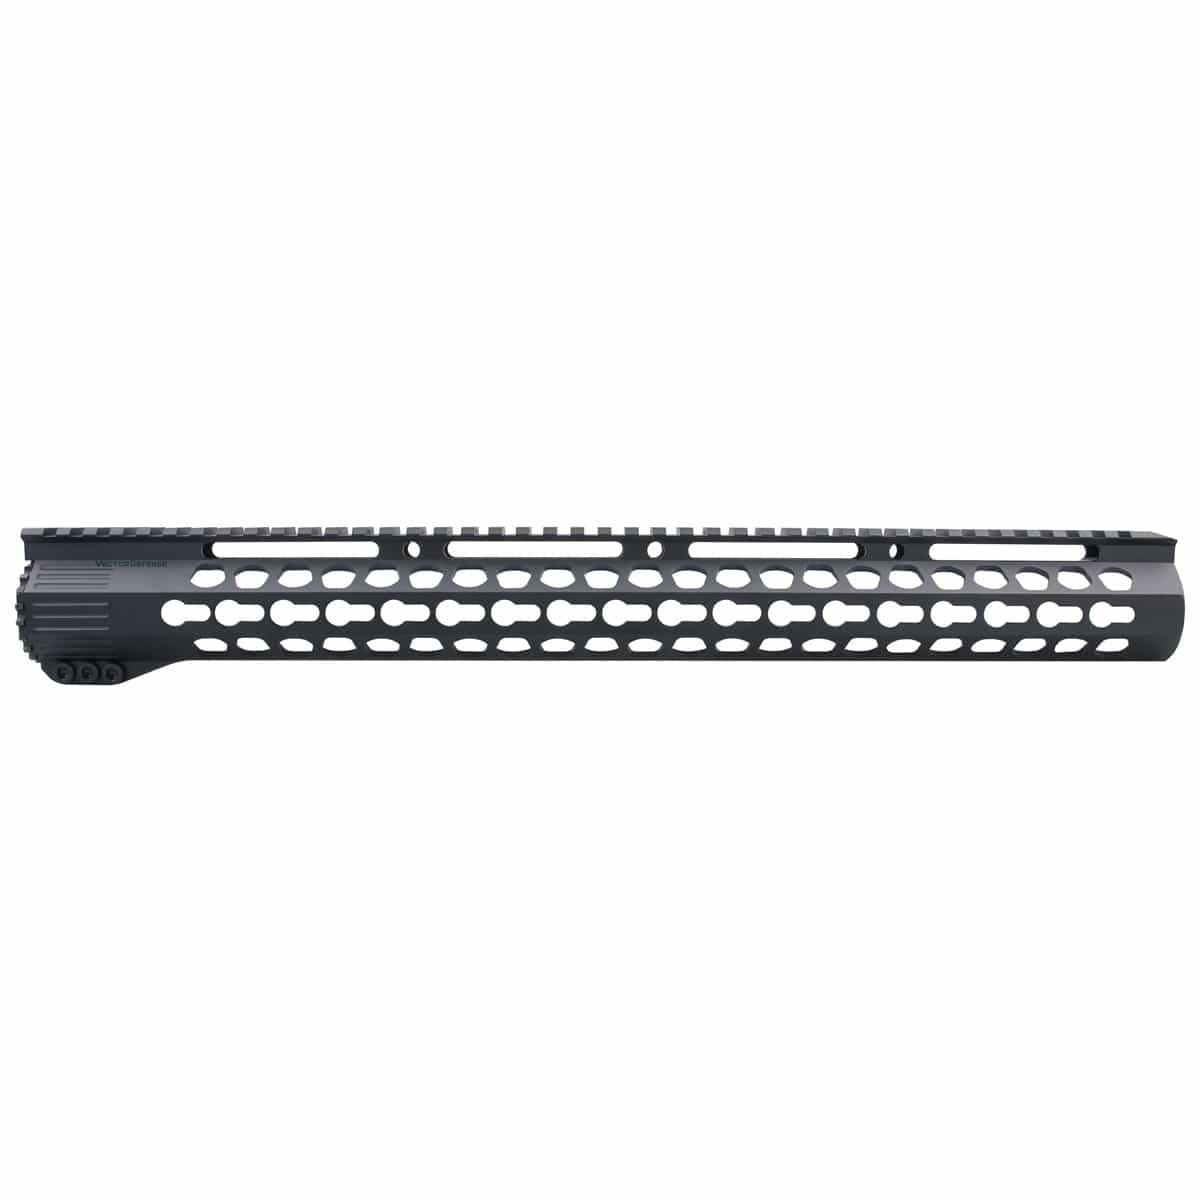 Slim KeyMod Free Float 17'' Ultra Handguard Rail